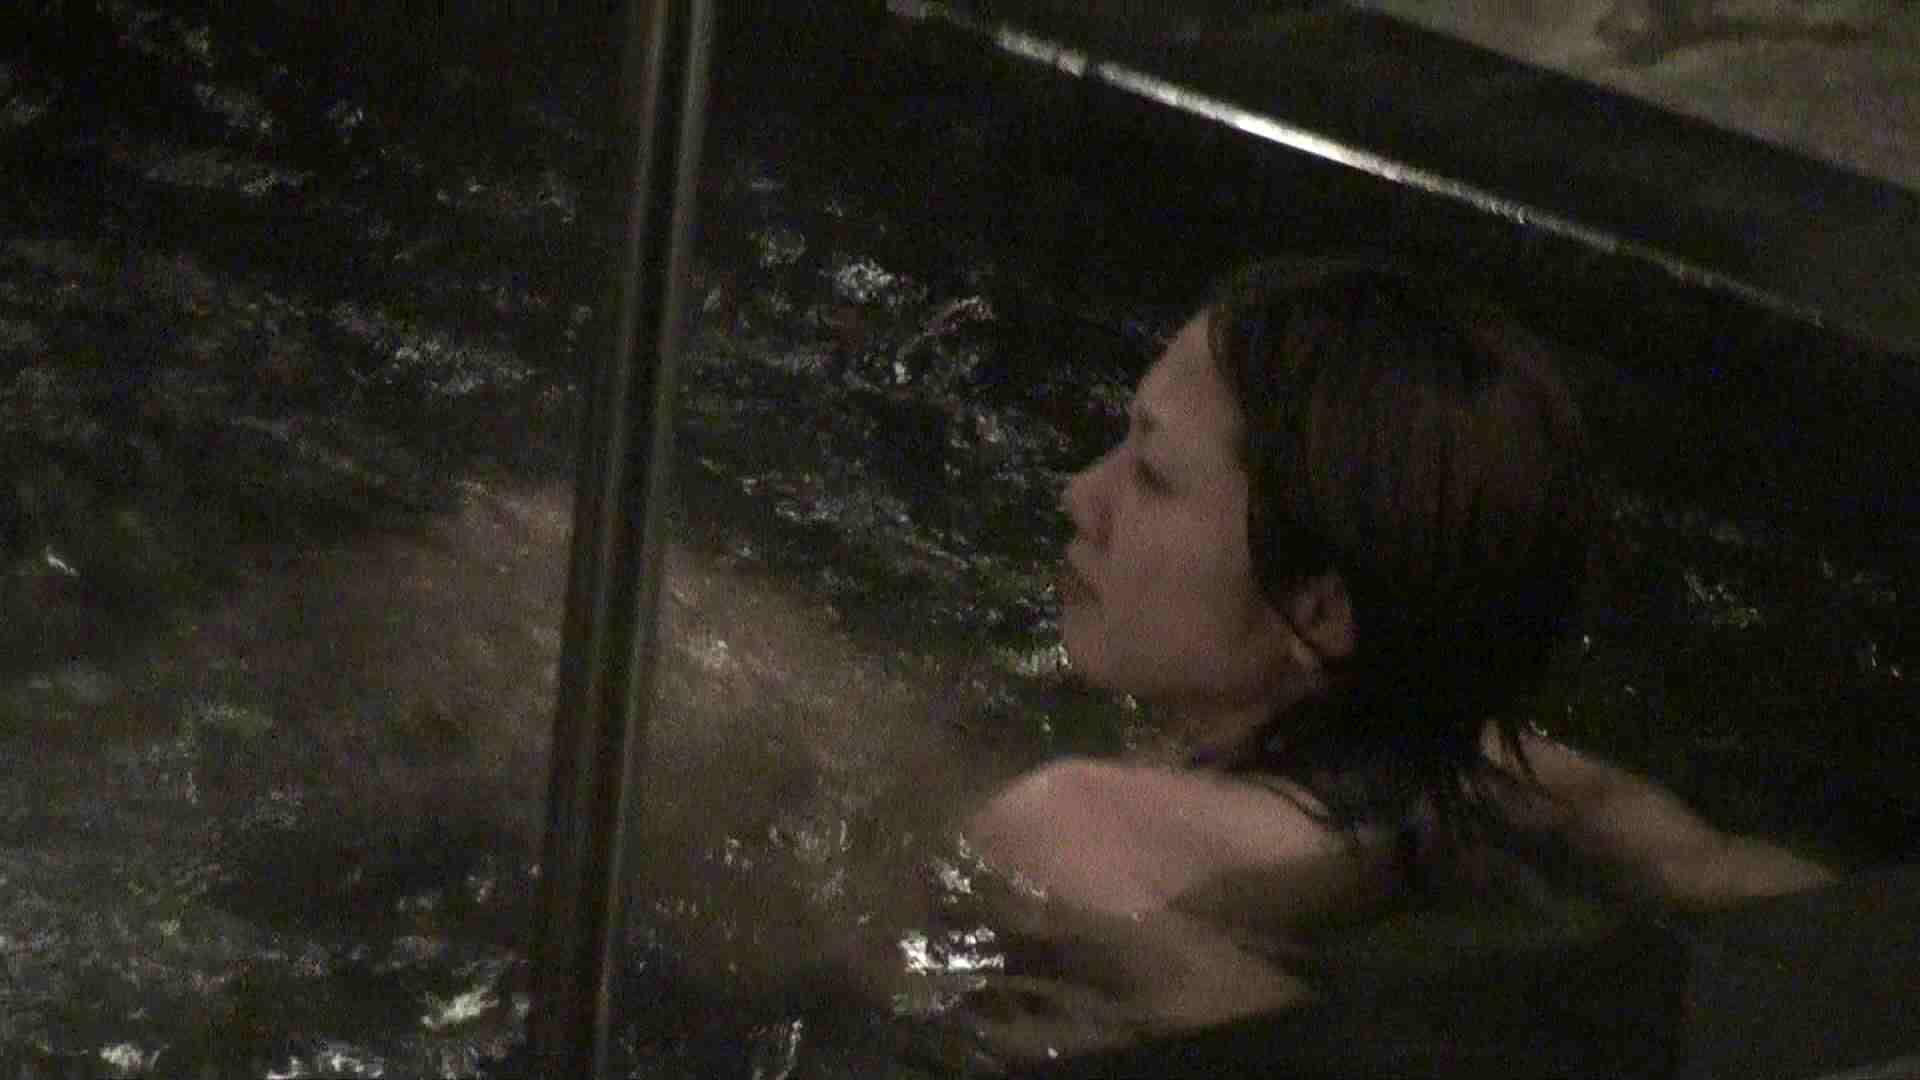 Aquaな露天風呂Vol.411 盗撮 | HなOL  49pic 24